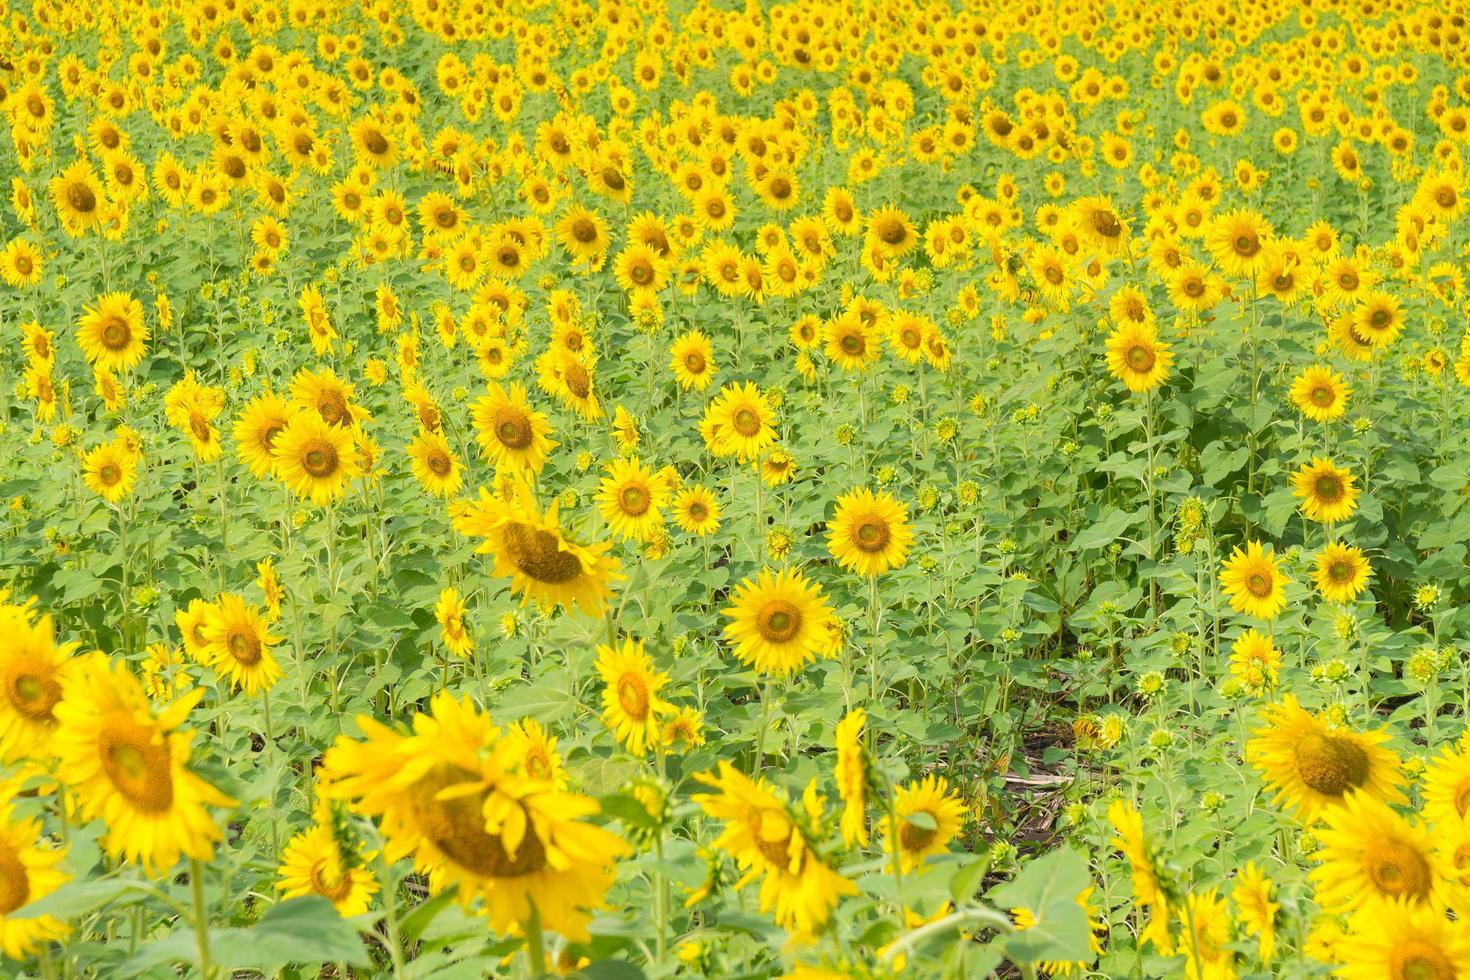 girasol presentado en tailandia foto